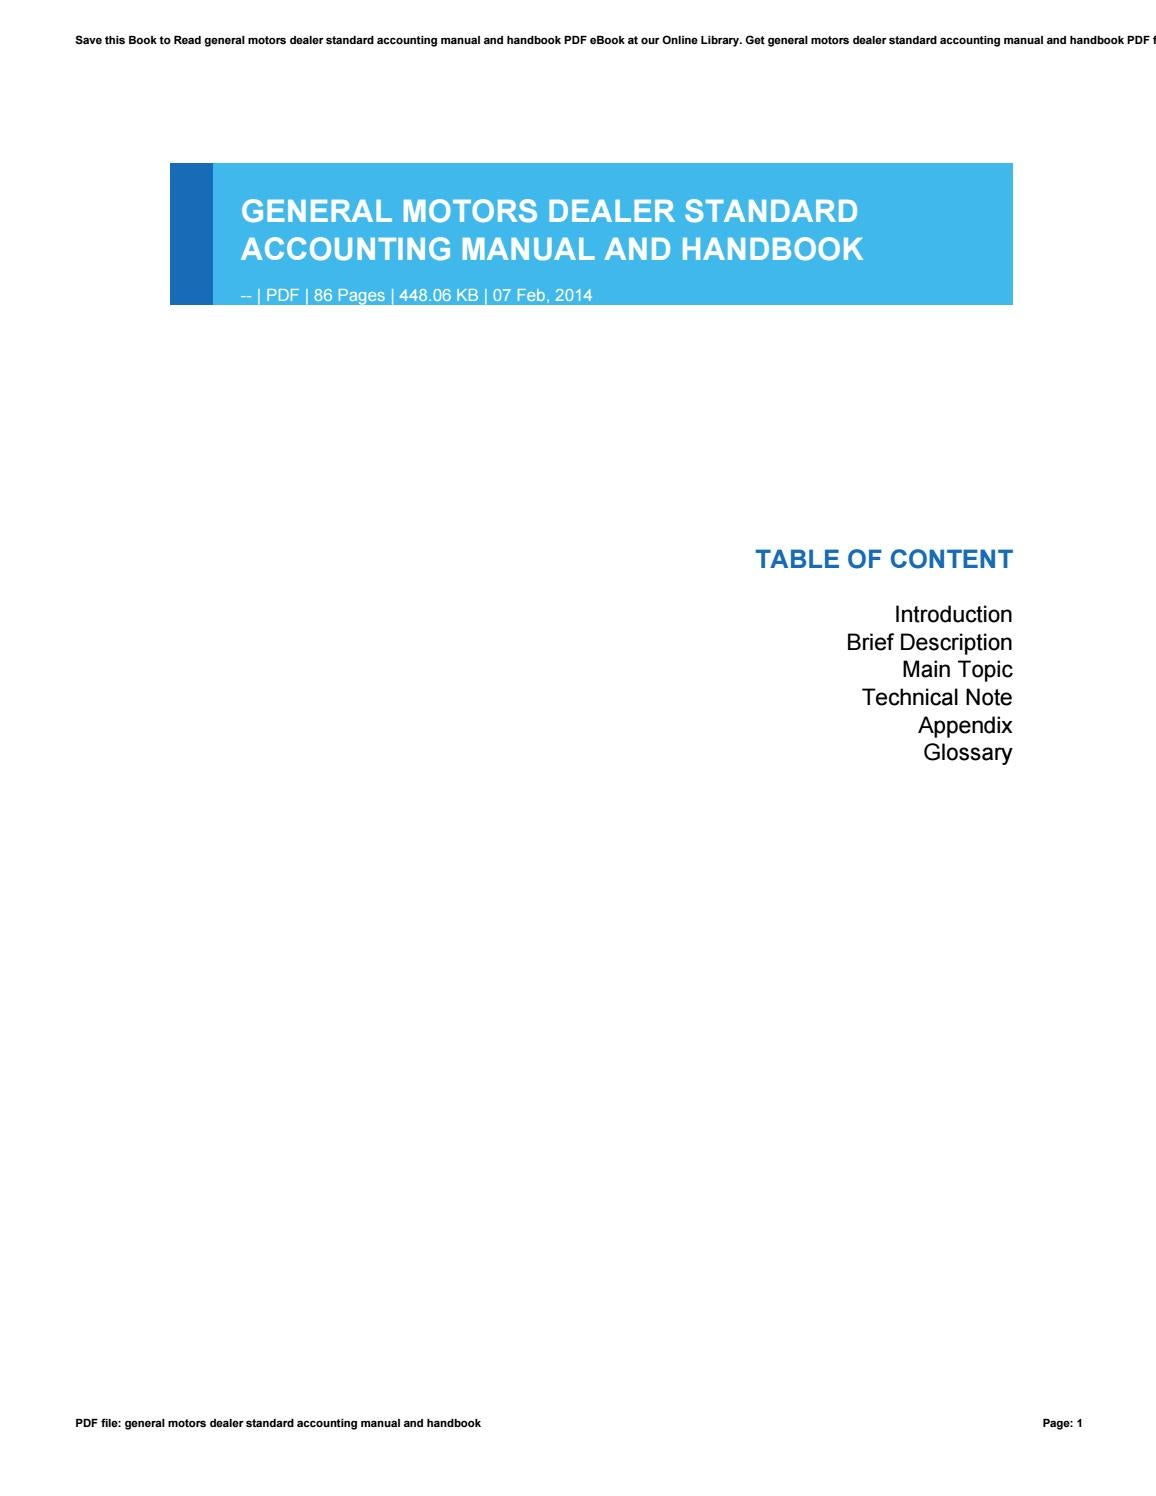 General motors dealer standard accounting manual and handbook by u097 -  issuu